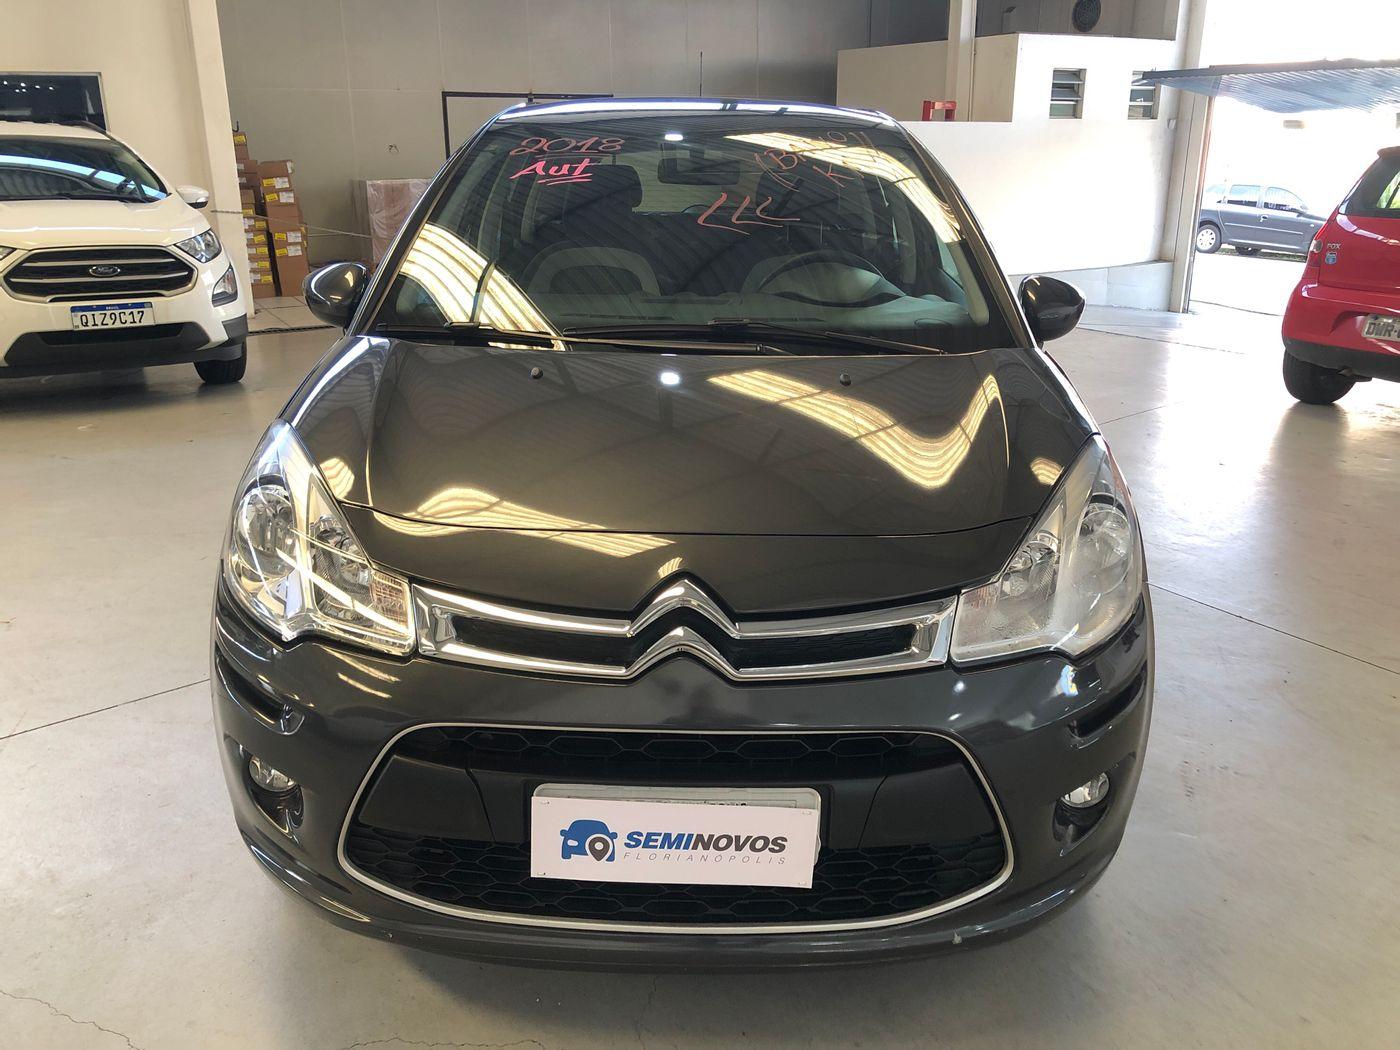 Citroën C3 Tendance 1.6 VTi Flex Start 16V Aut.